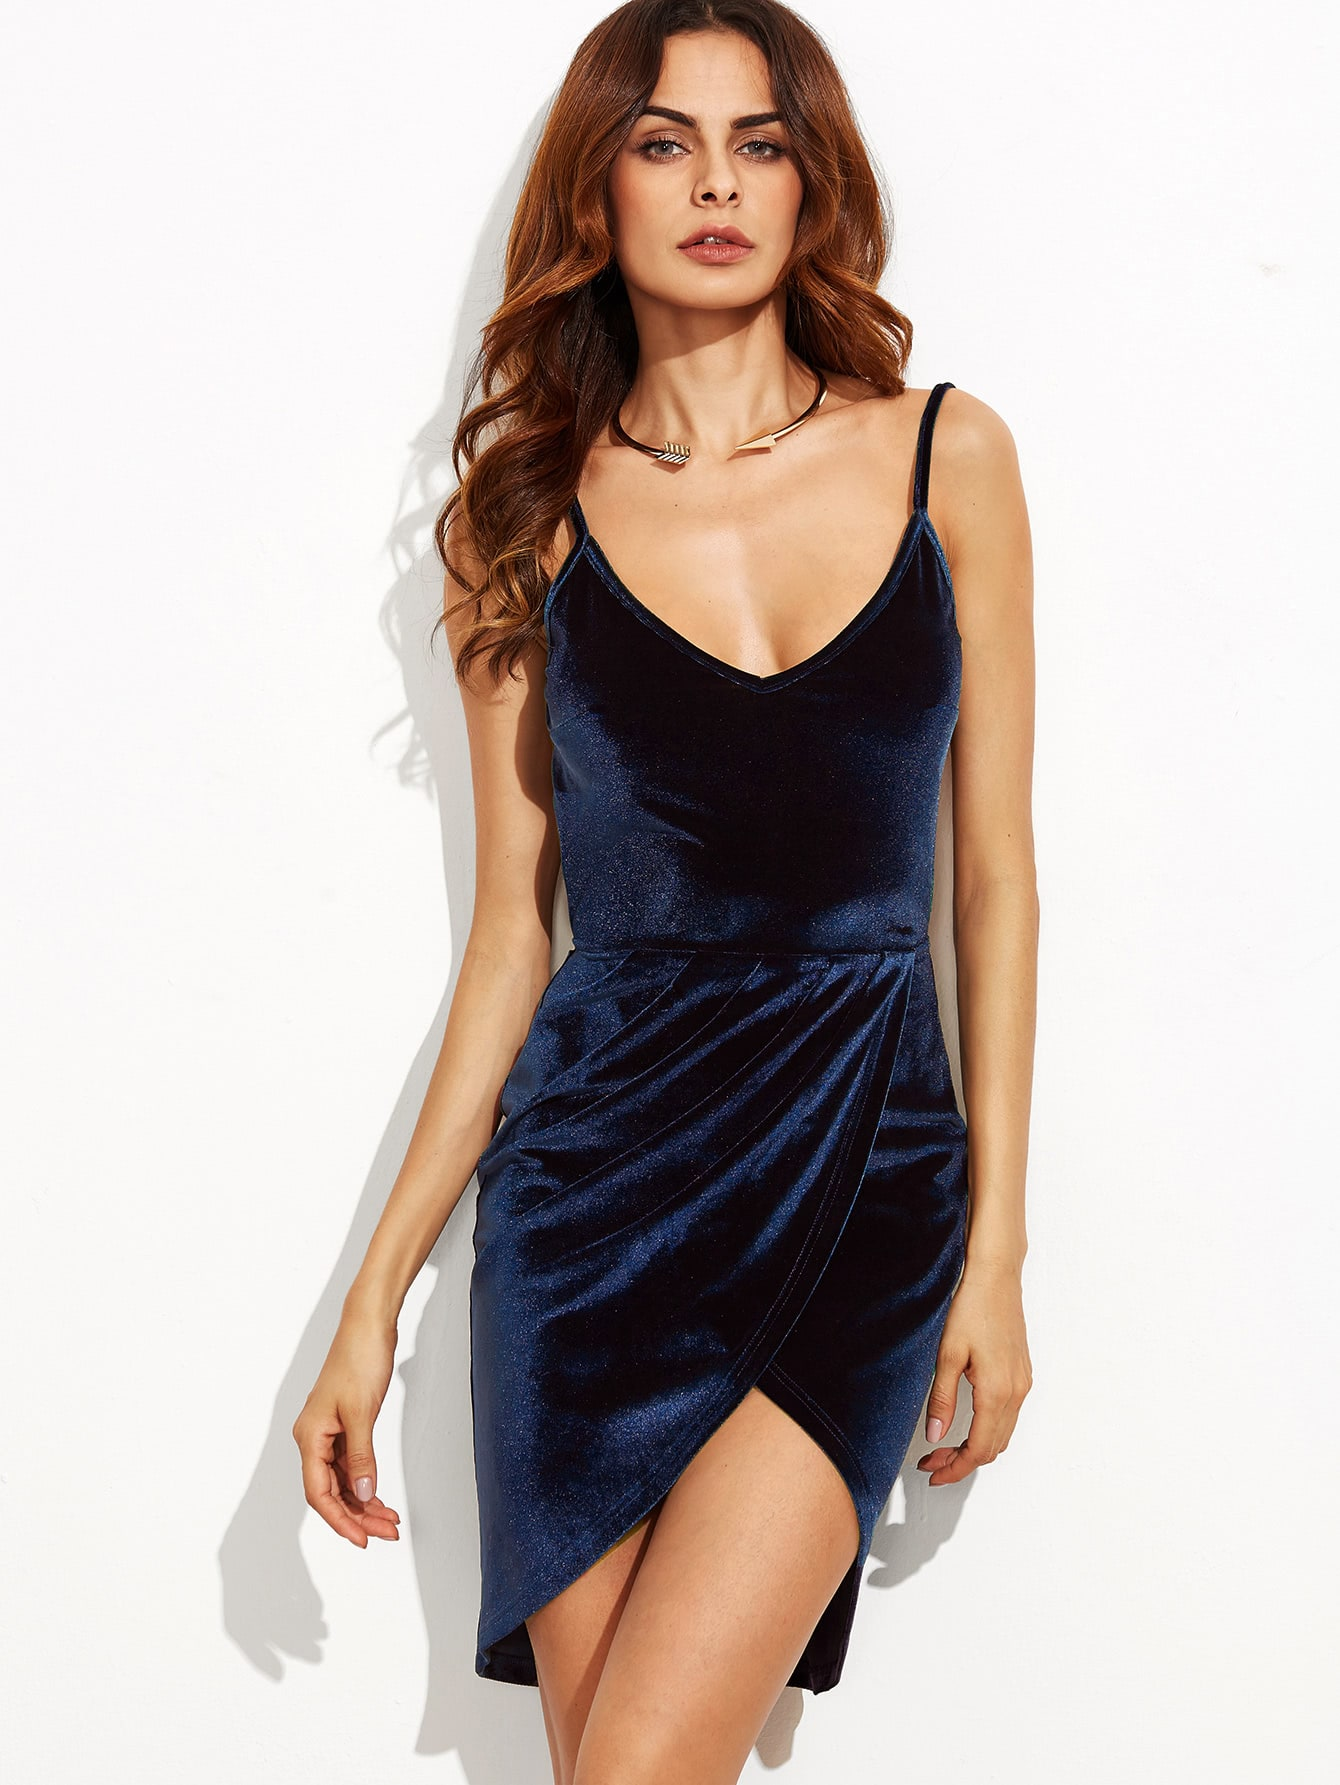 Party Dresses- Women&-39-s Sexy Party Dresses Cheap - SheIn.com